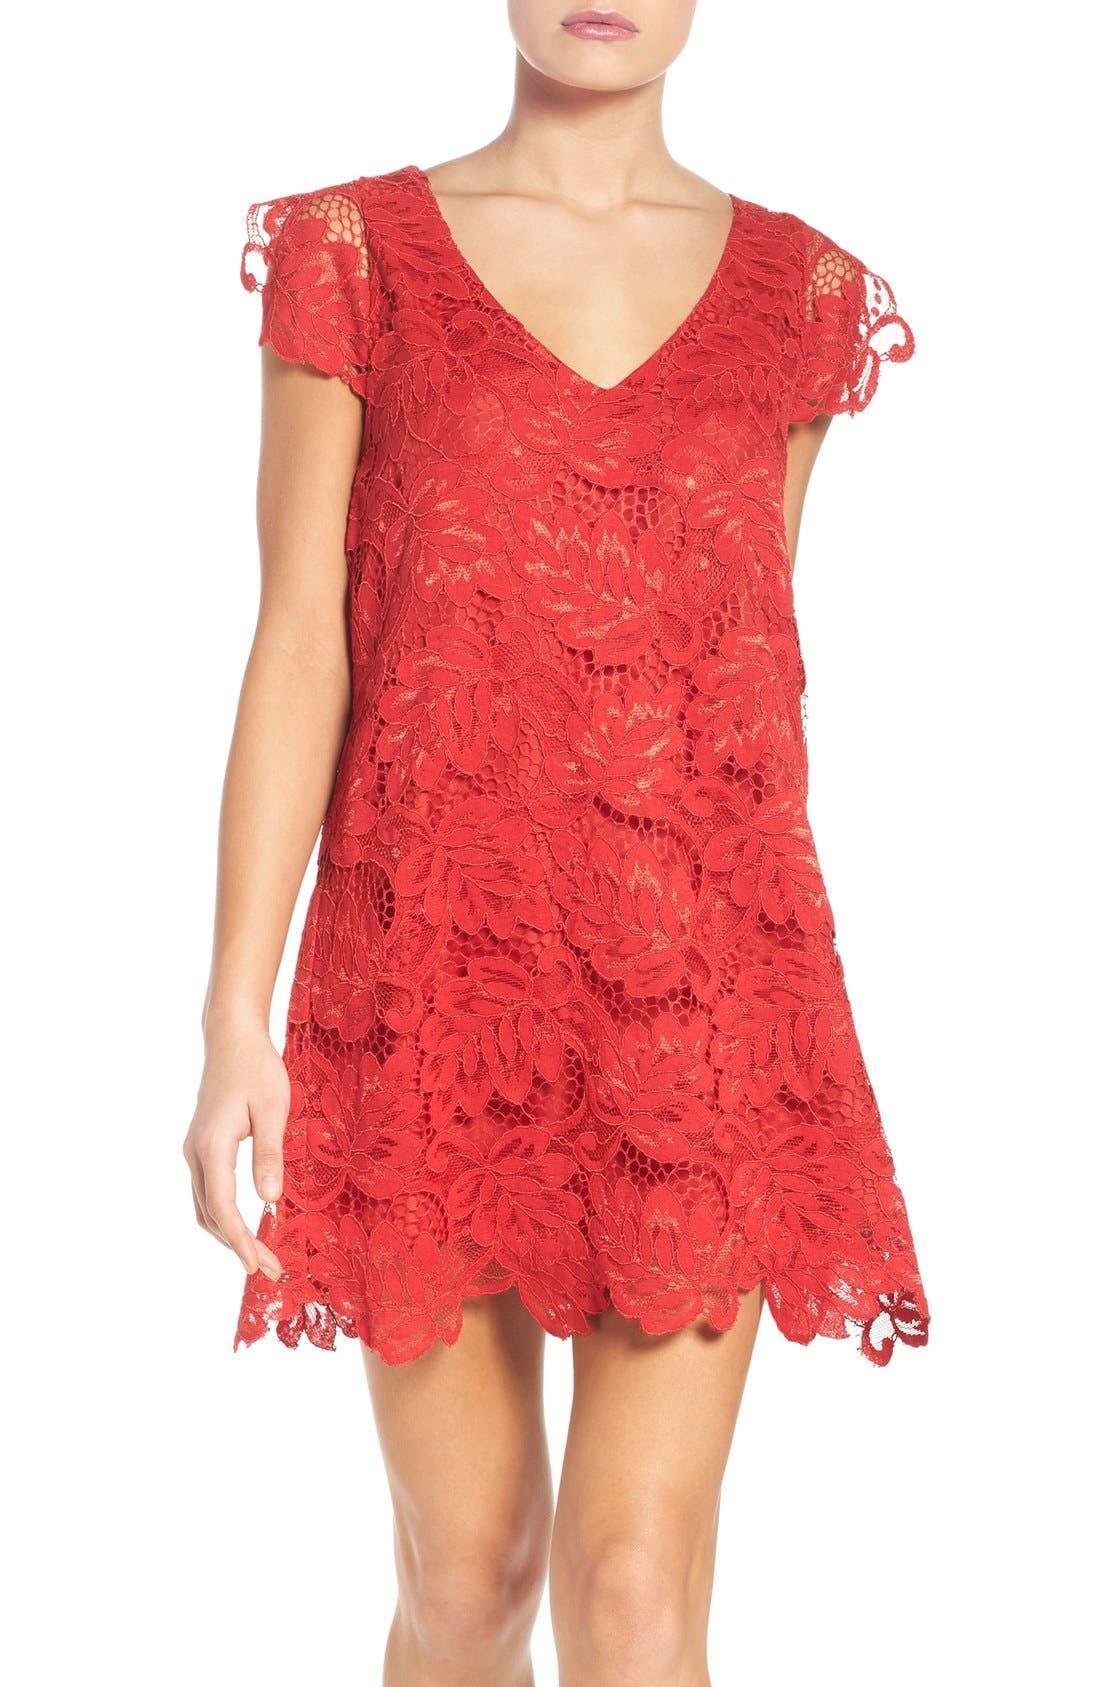 0b68a65d6b7 Women s Lace Dresses